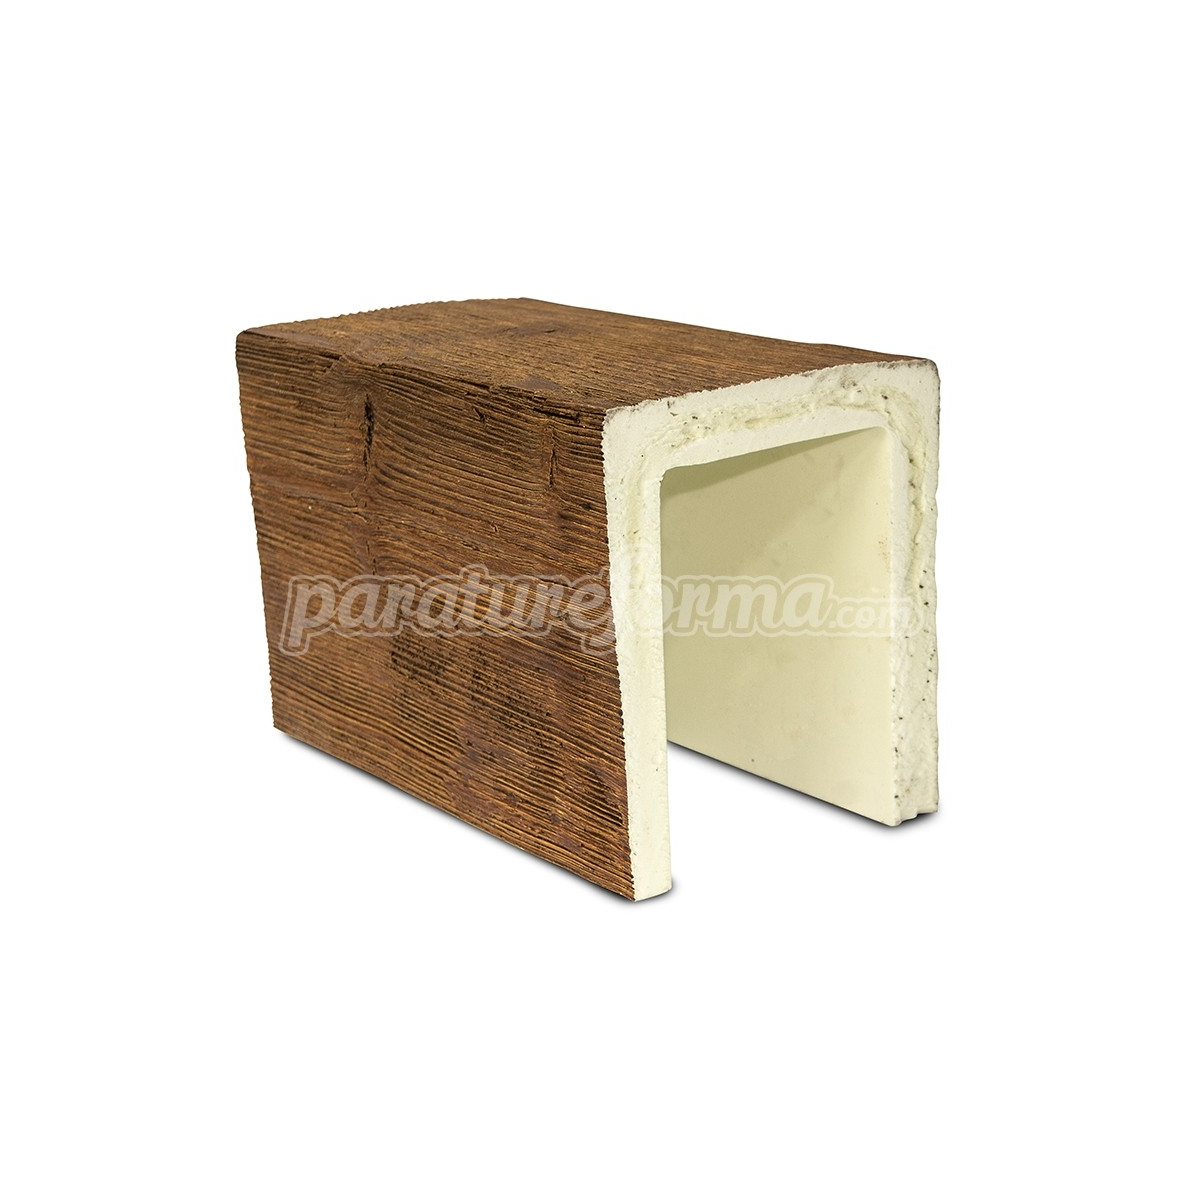 Viga imitación a madera 300x15x18 - Vigas imitación madera cuadradas